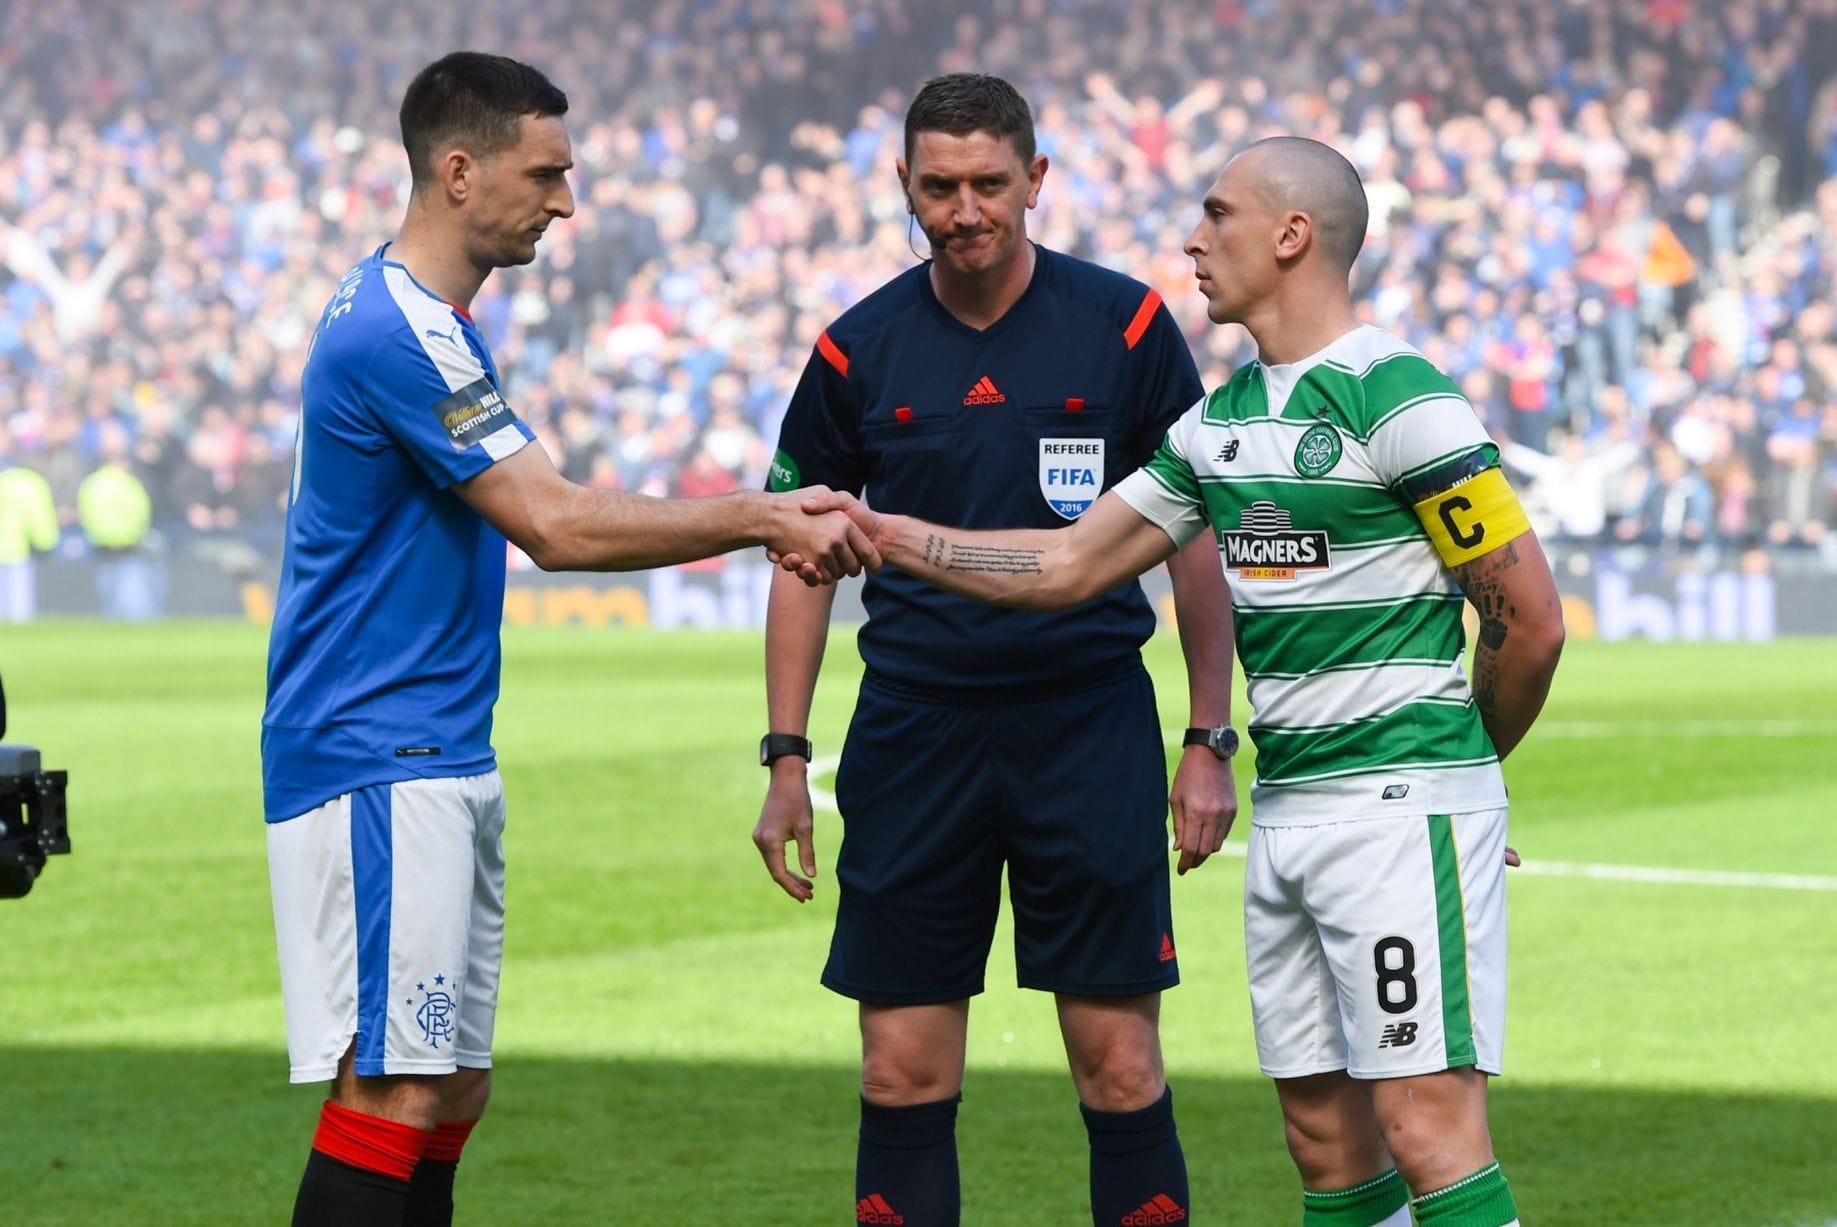 celtic vs rangers - photo #21